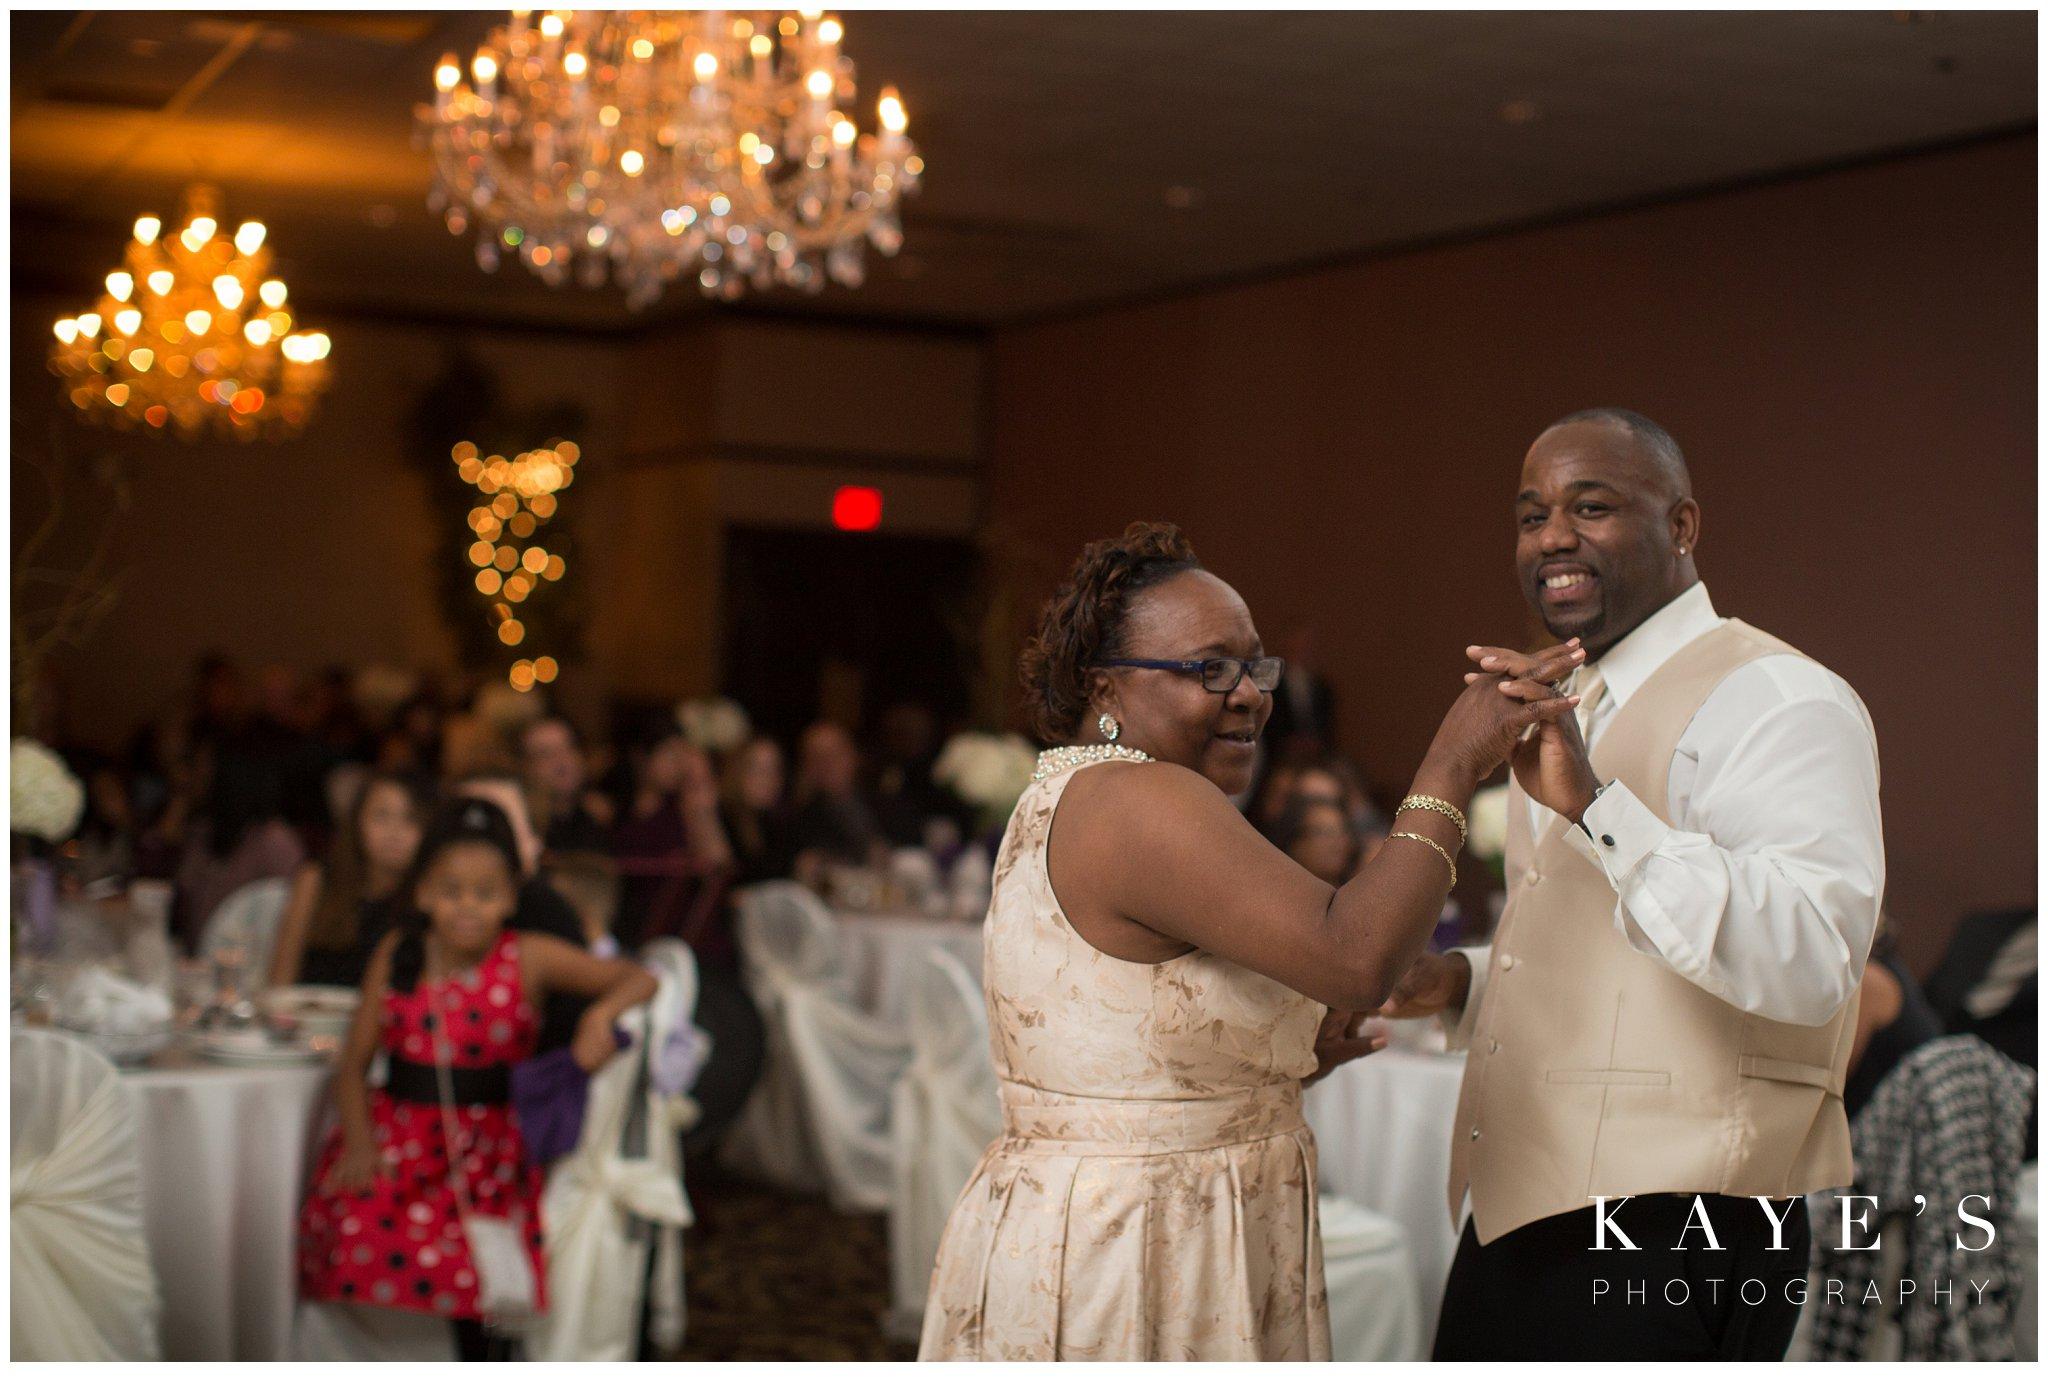 Kayes Photography- howell-michigan-wedding-photographer_0658.jpg